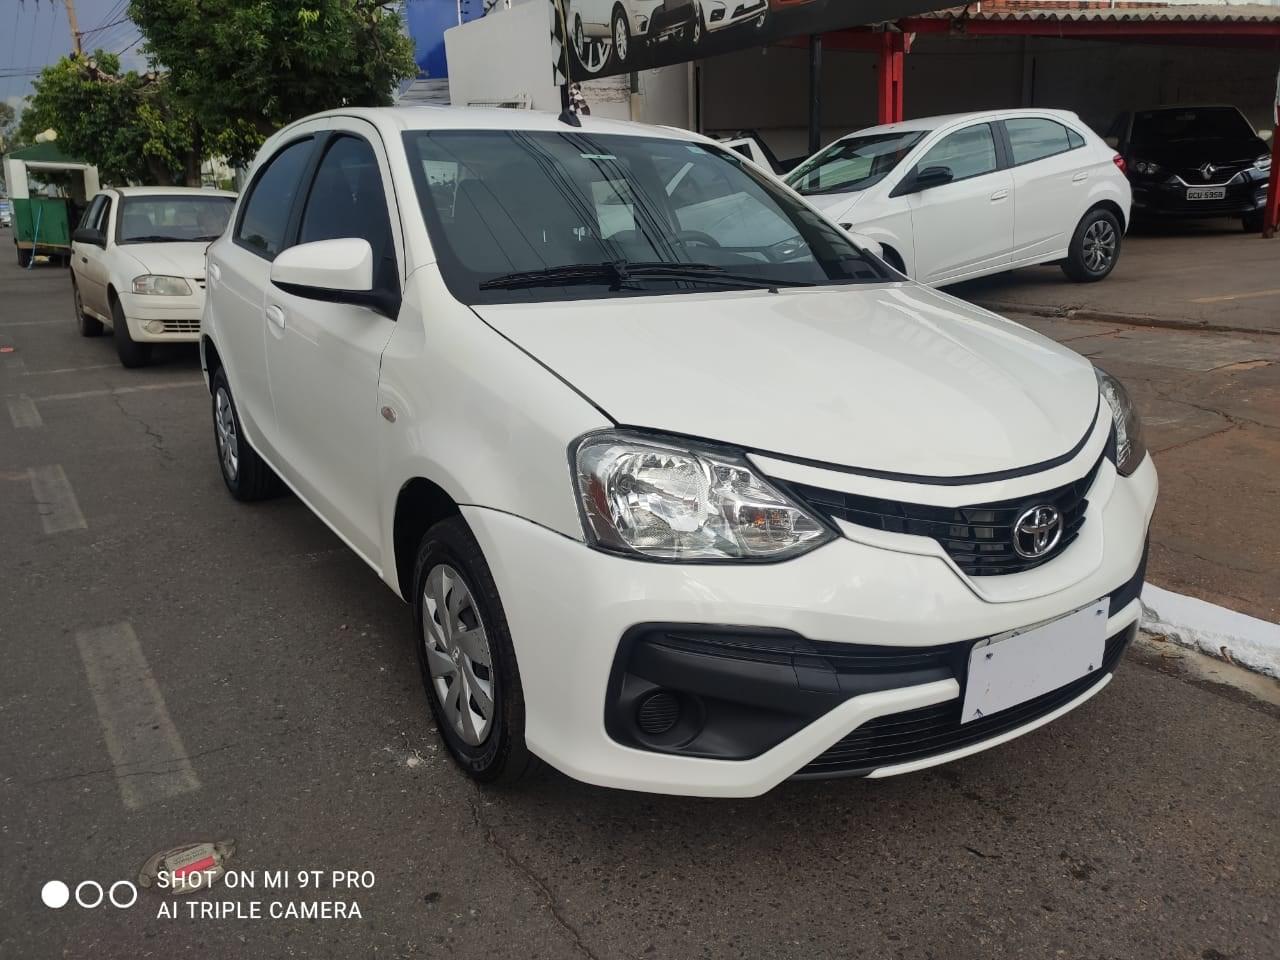 //www.autoline.com.br/carro/toyota/etios-15-xs-16v-flex-4p-manual/2018/cuiaba-mt/14015505